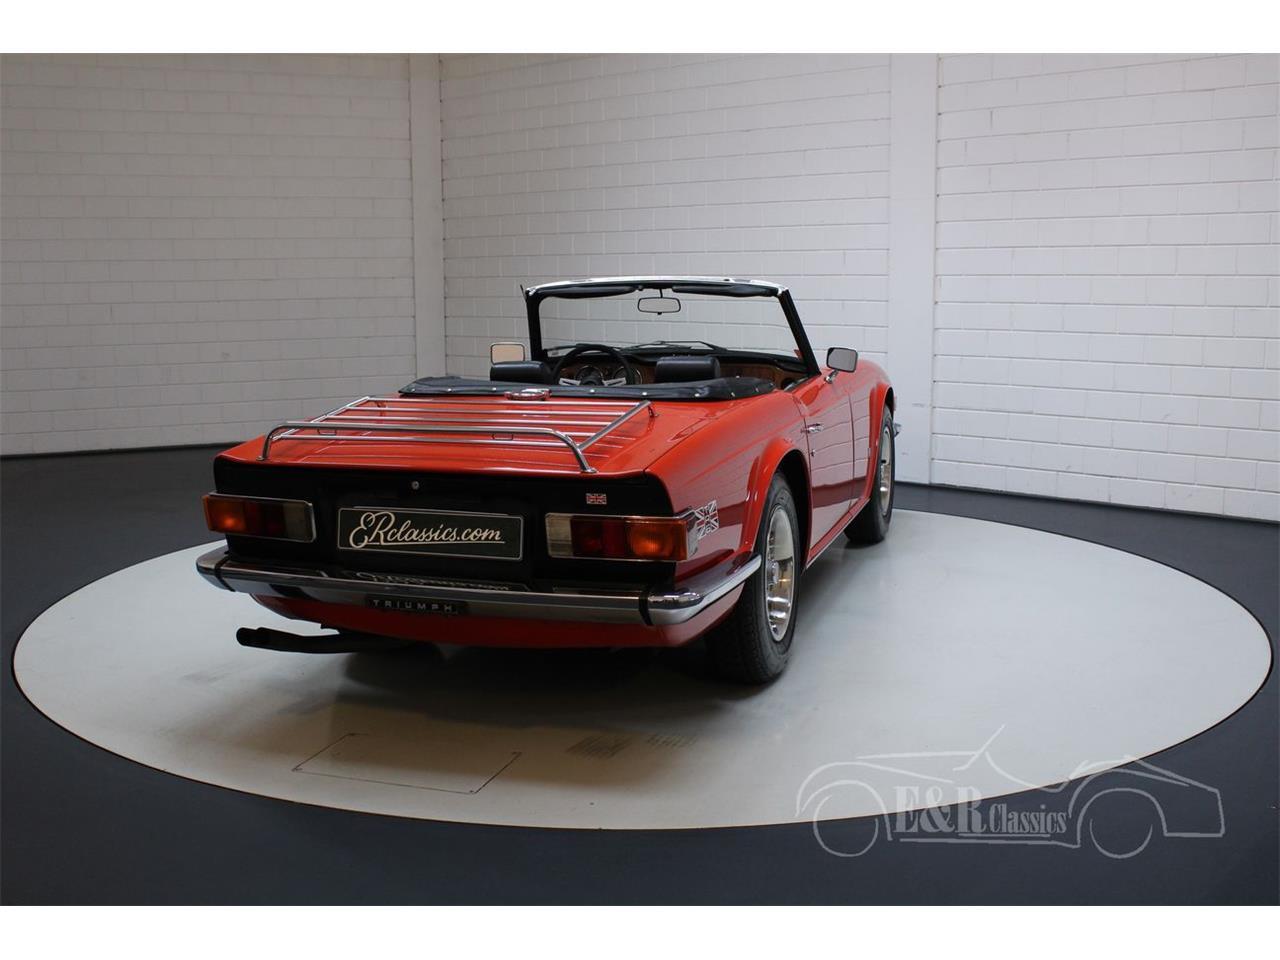 1974 Triumph TR6 (CC-1413872) for sale in Waalwijk, Noord-Brabant